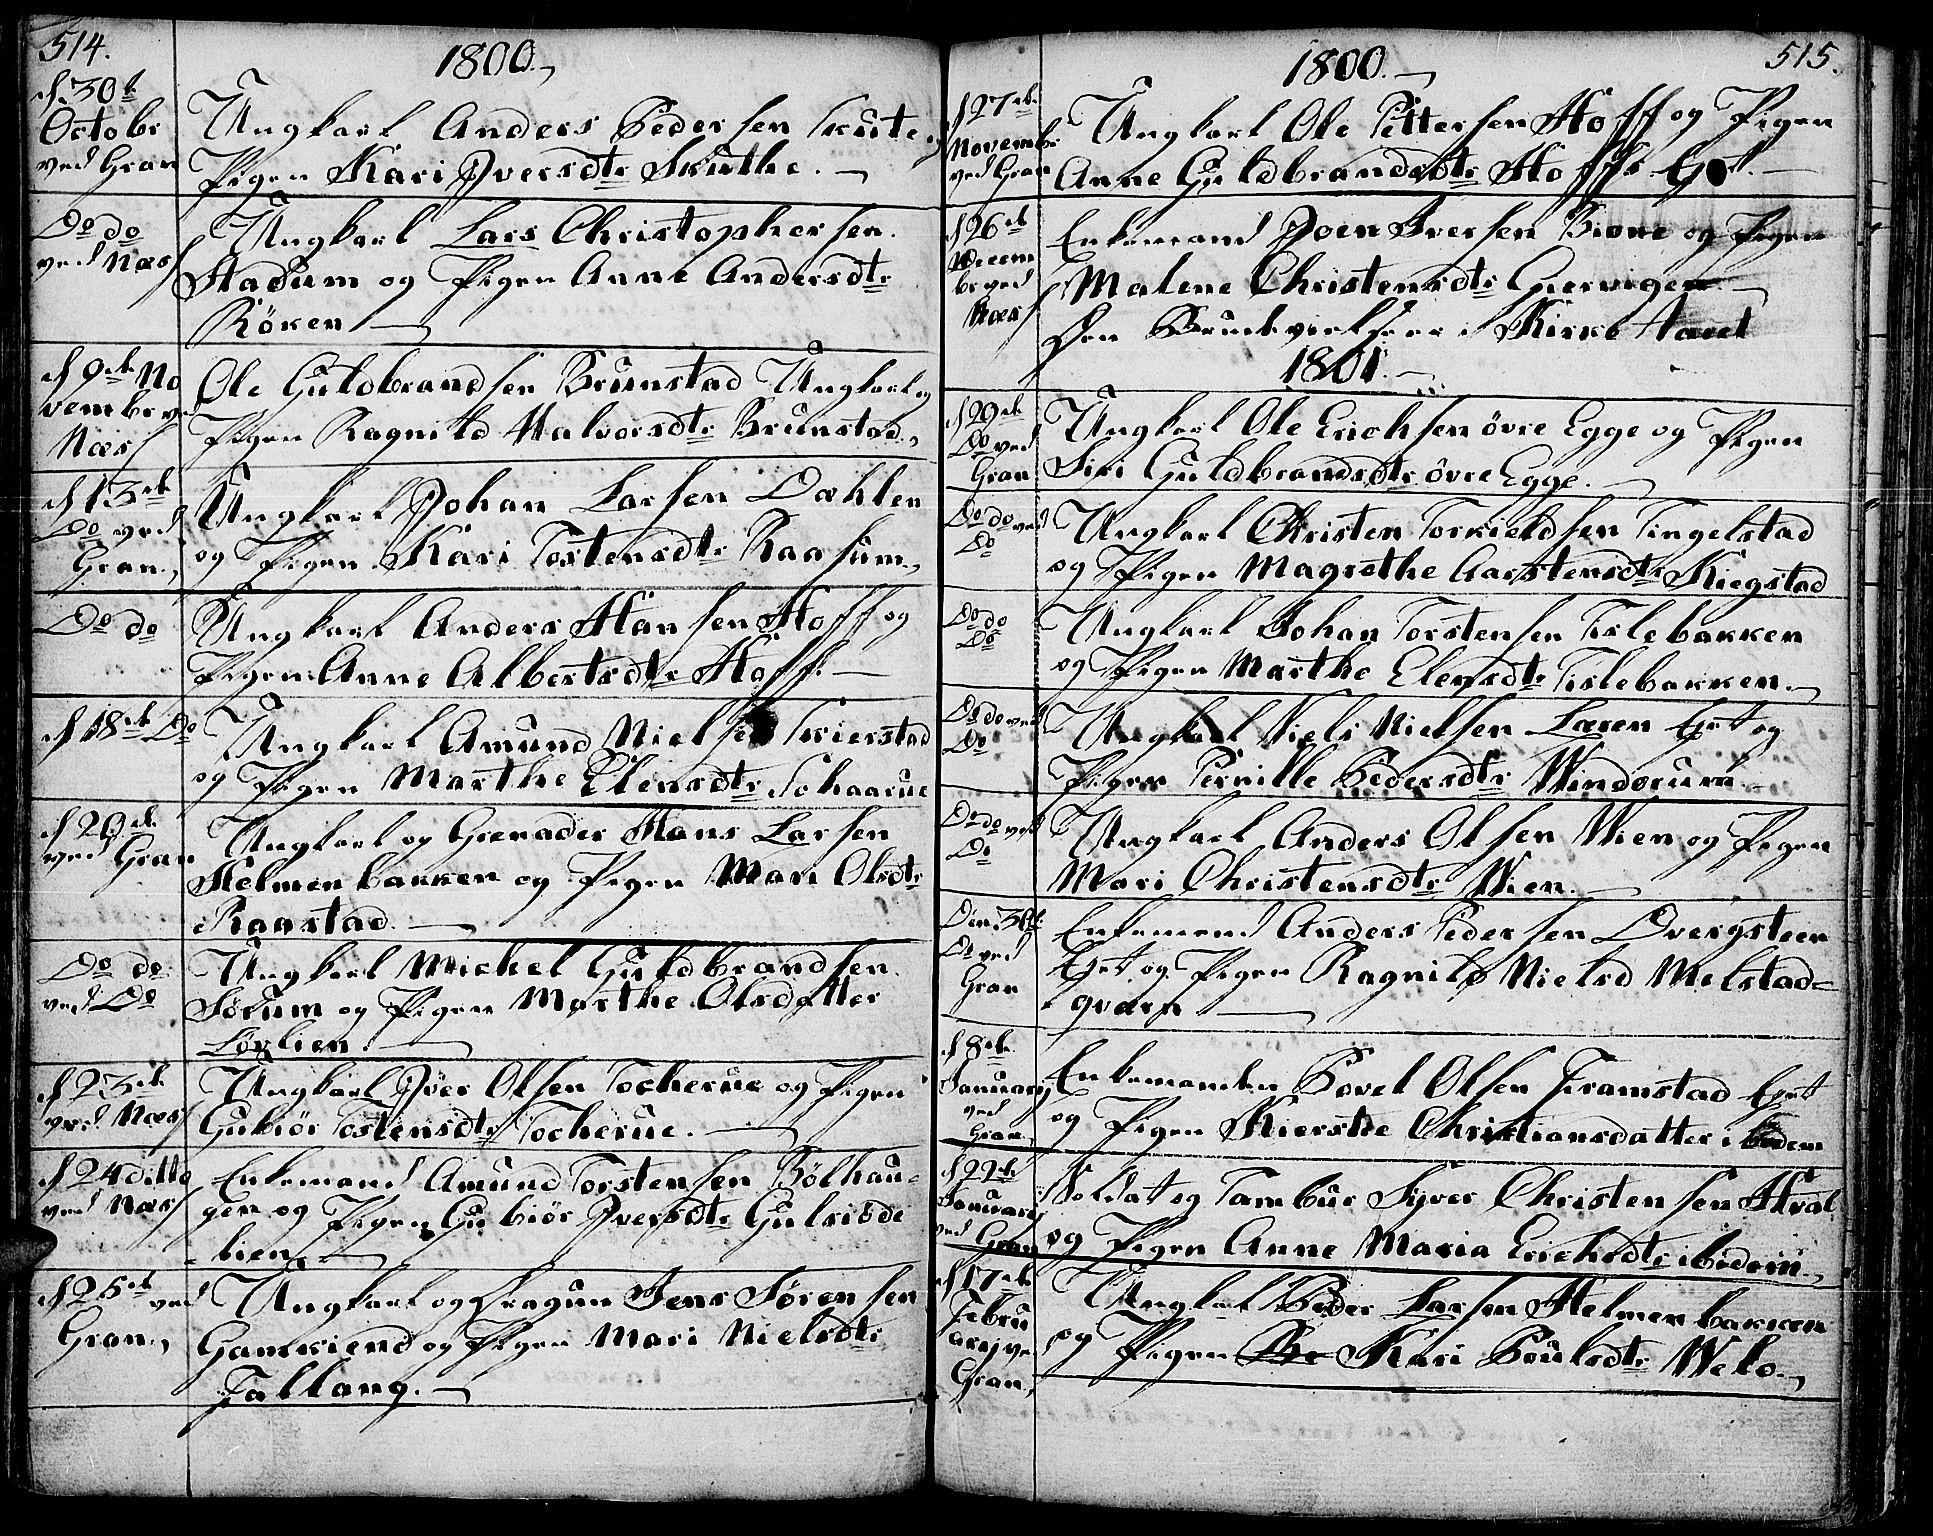 SAH, Gran prestekontor, Ministerialbok nr. 6, 1787-1824, s. 514-515